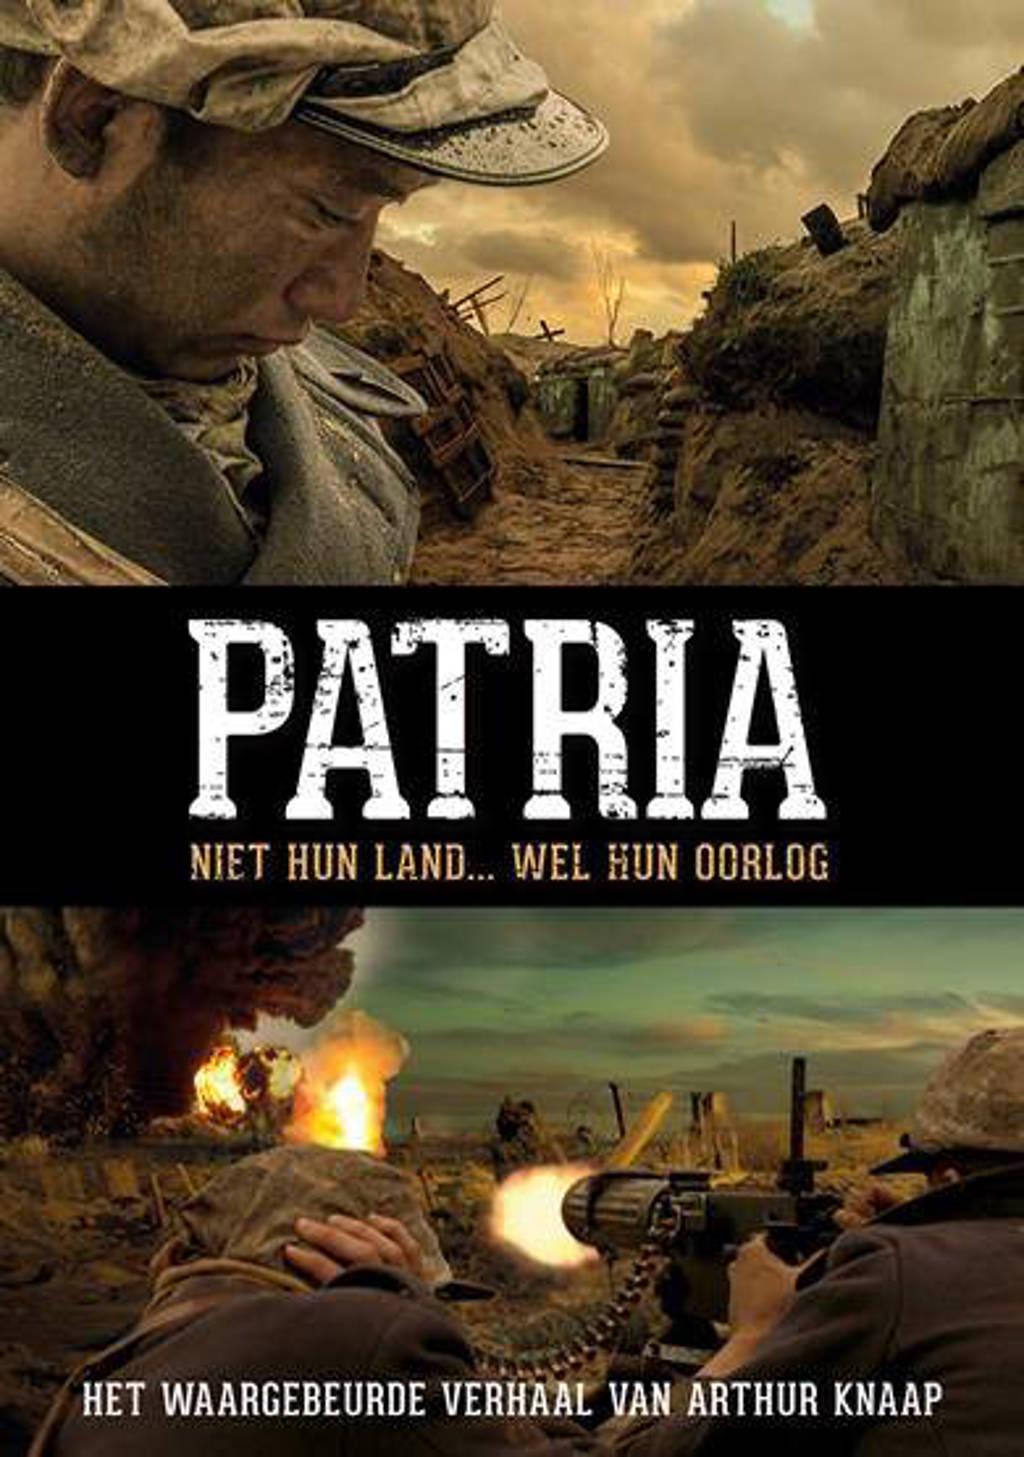 Patria (DVD)